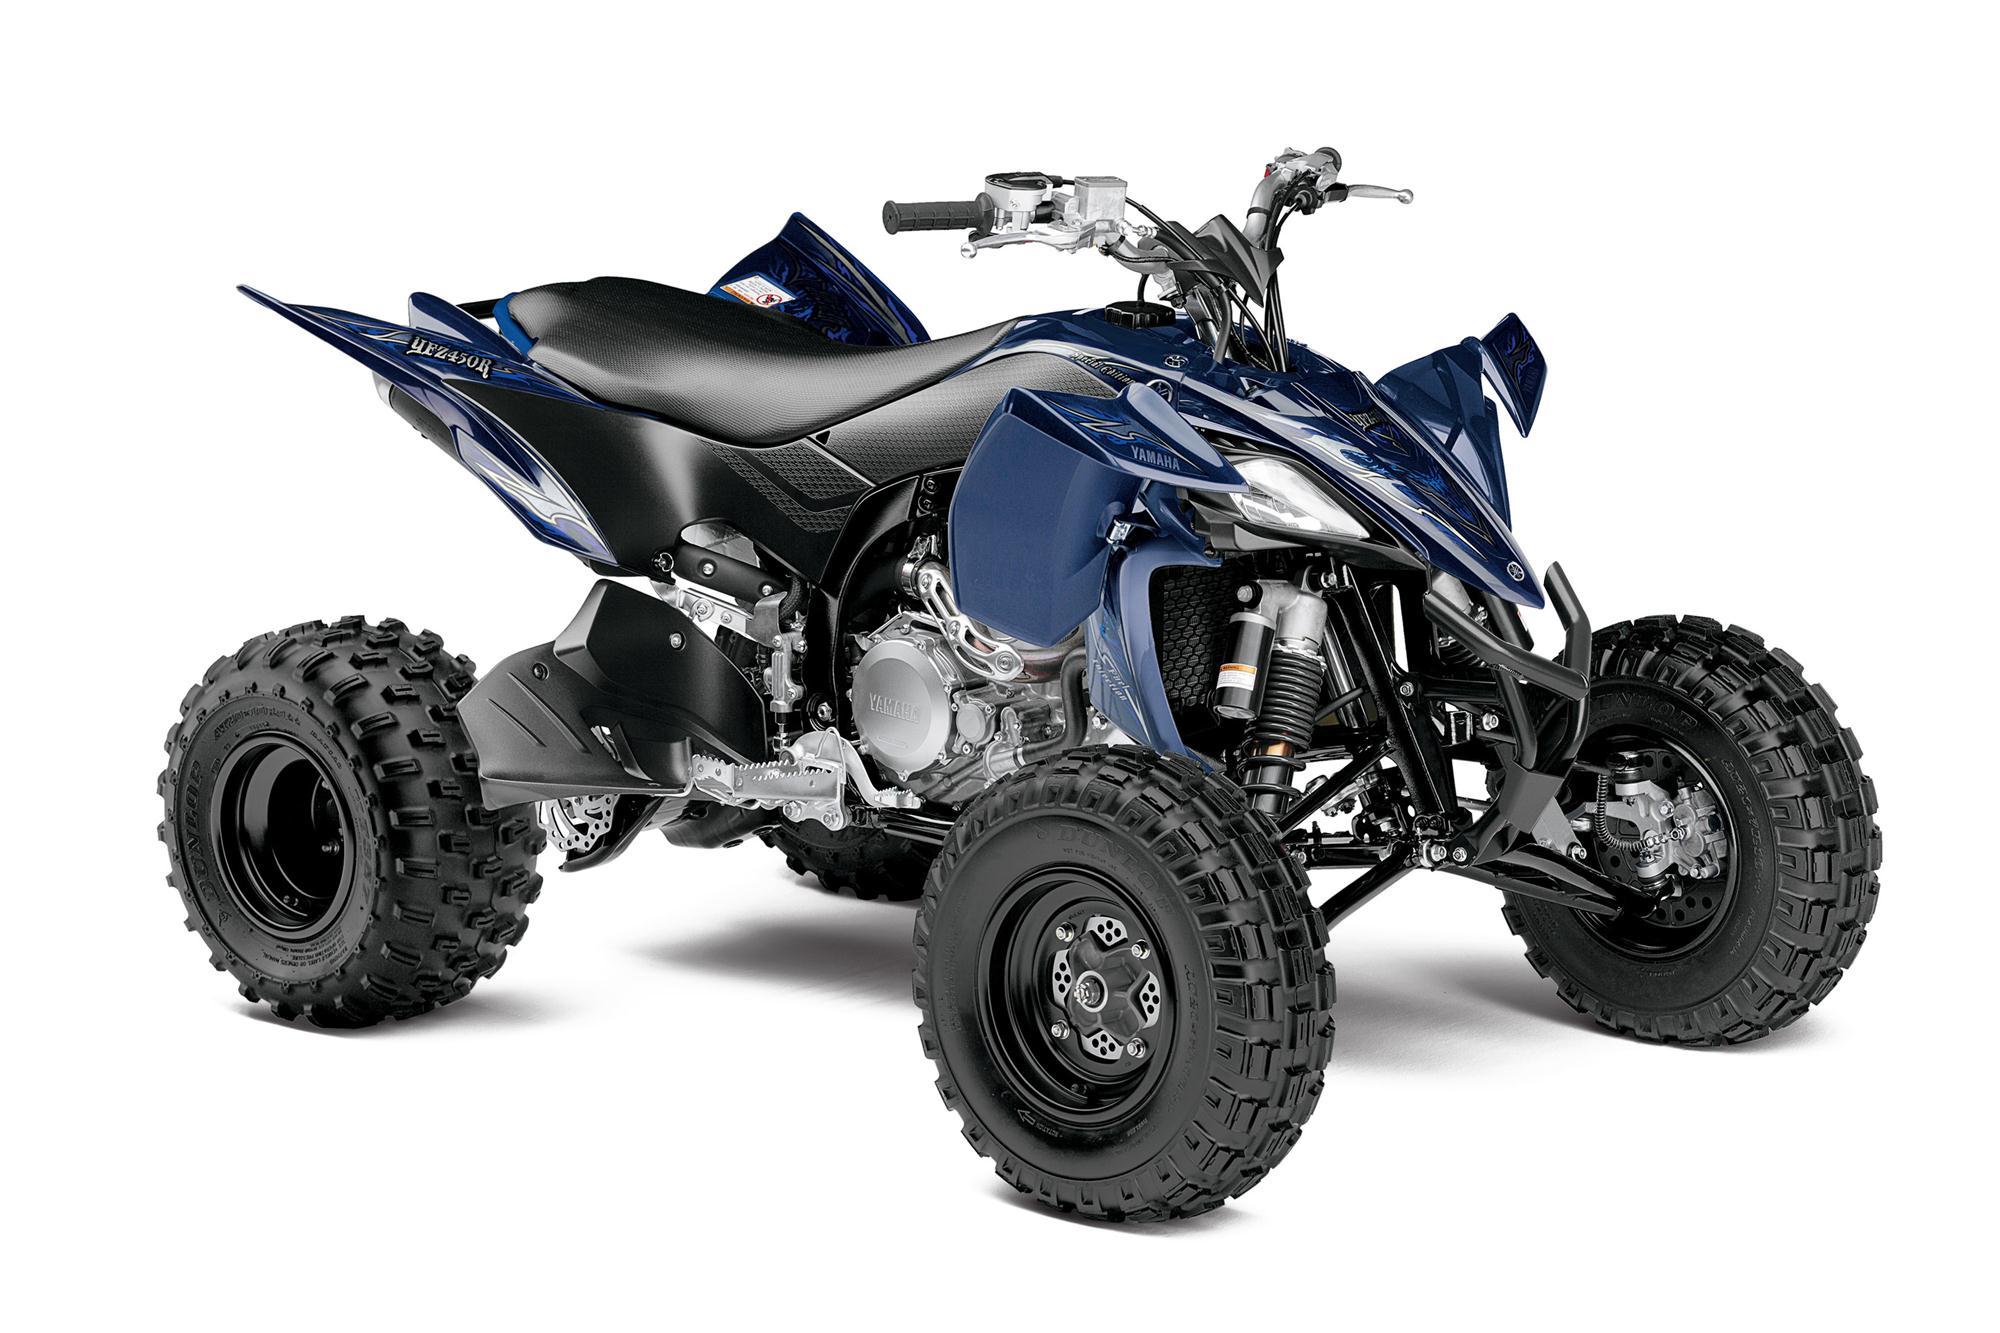 2013 yamaha yfz450r se atv motocross superlative for 2016 yamaha yfz450r se